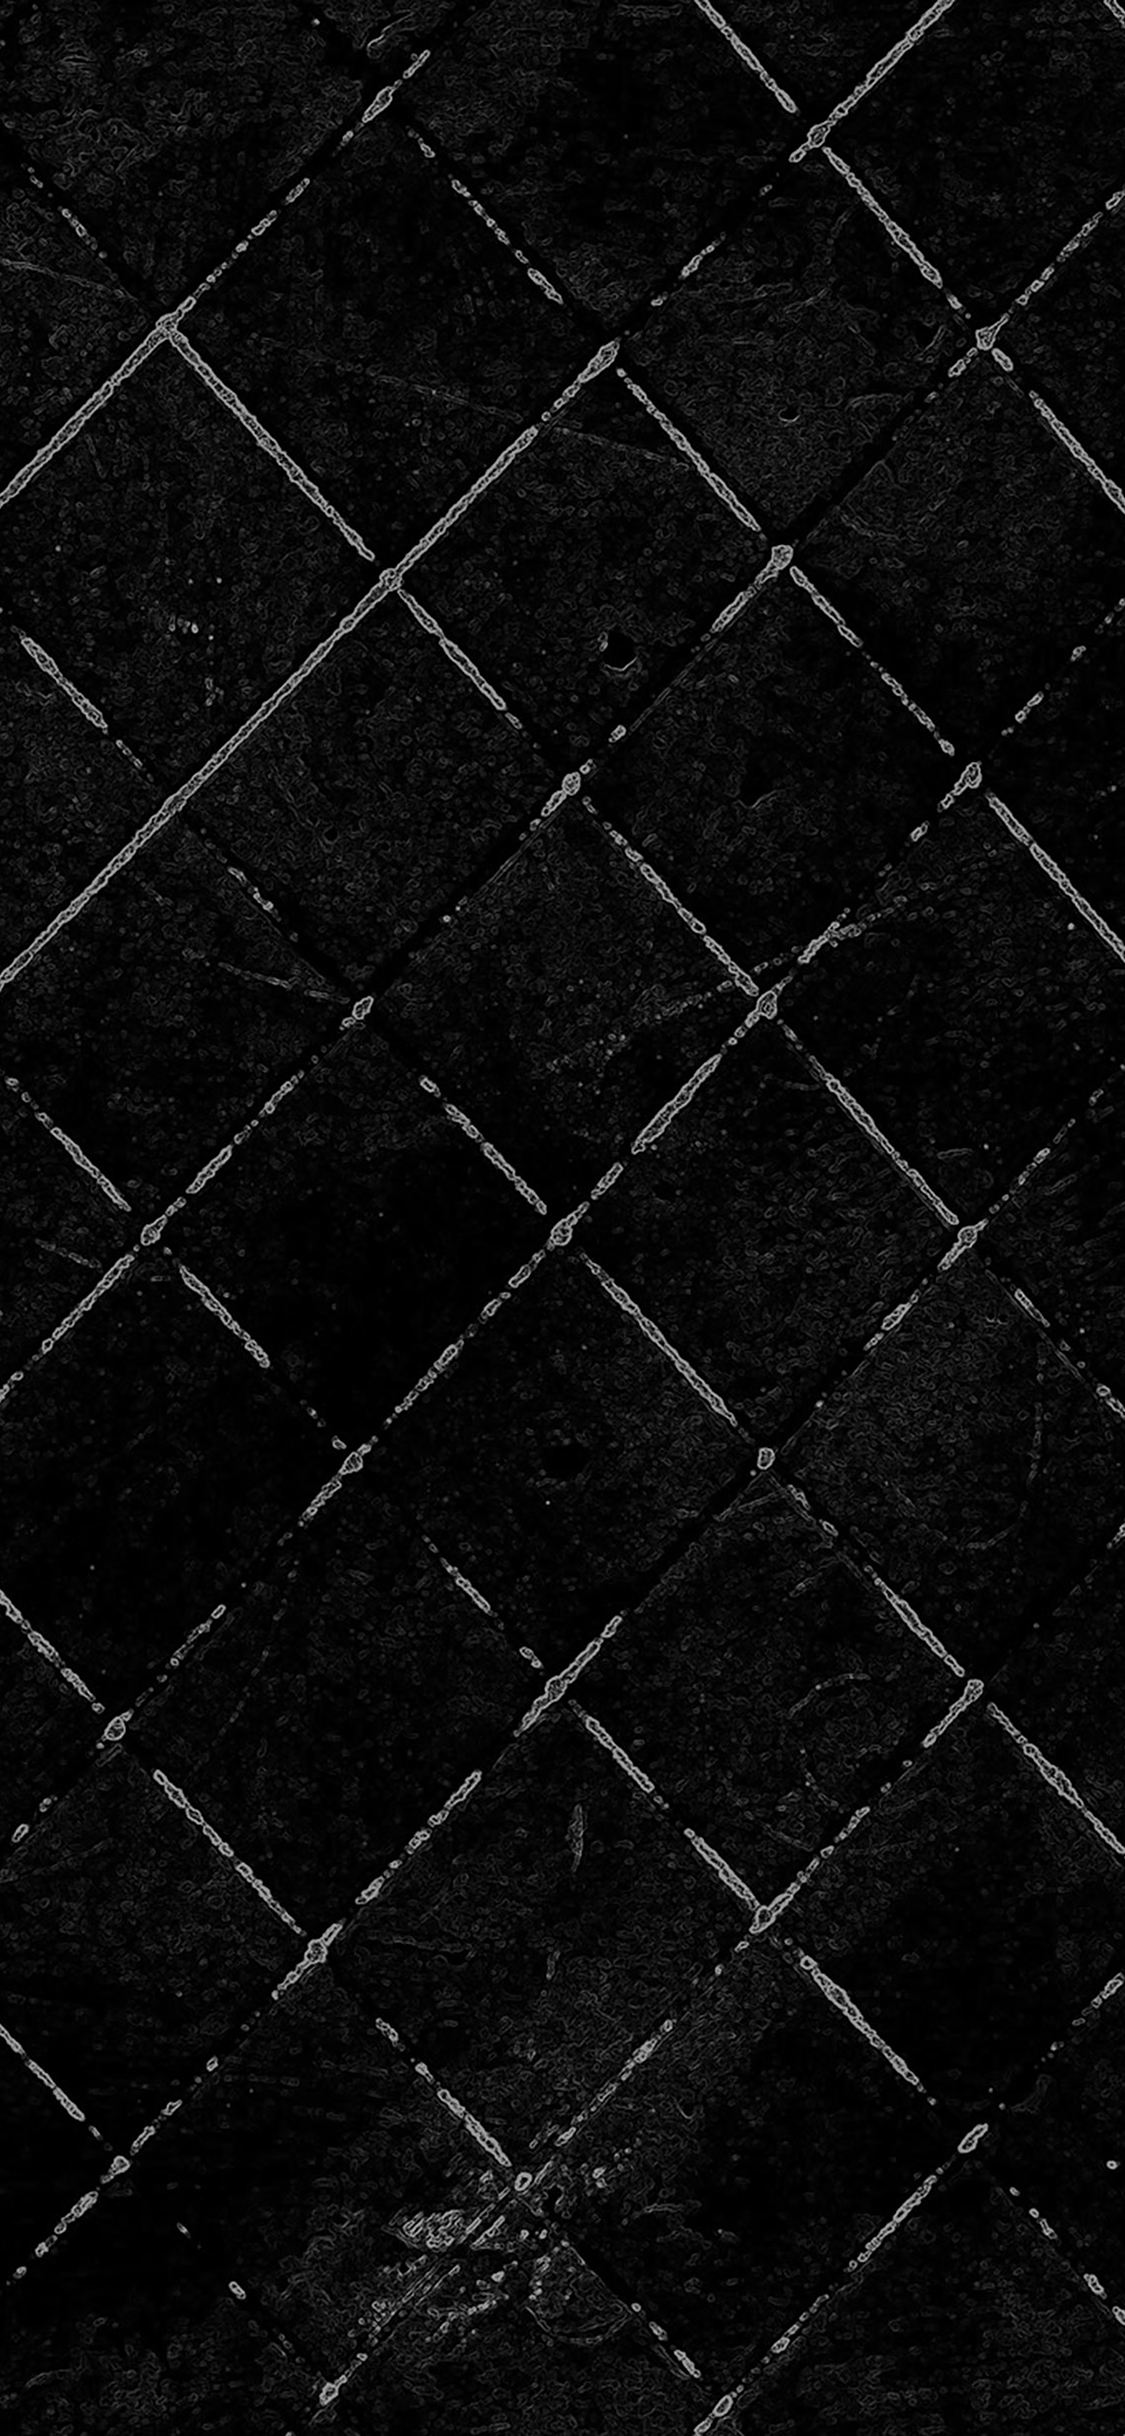 Black Grunge Aesthetic Wallpapers Wallpaper Cave